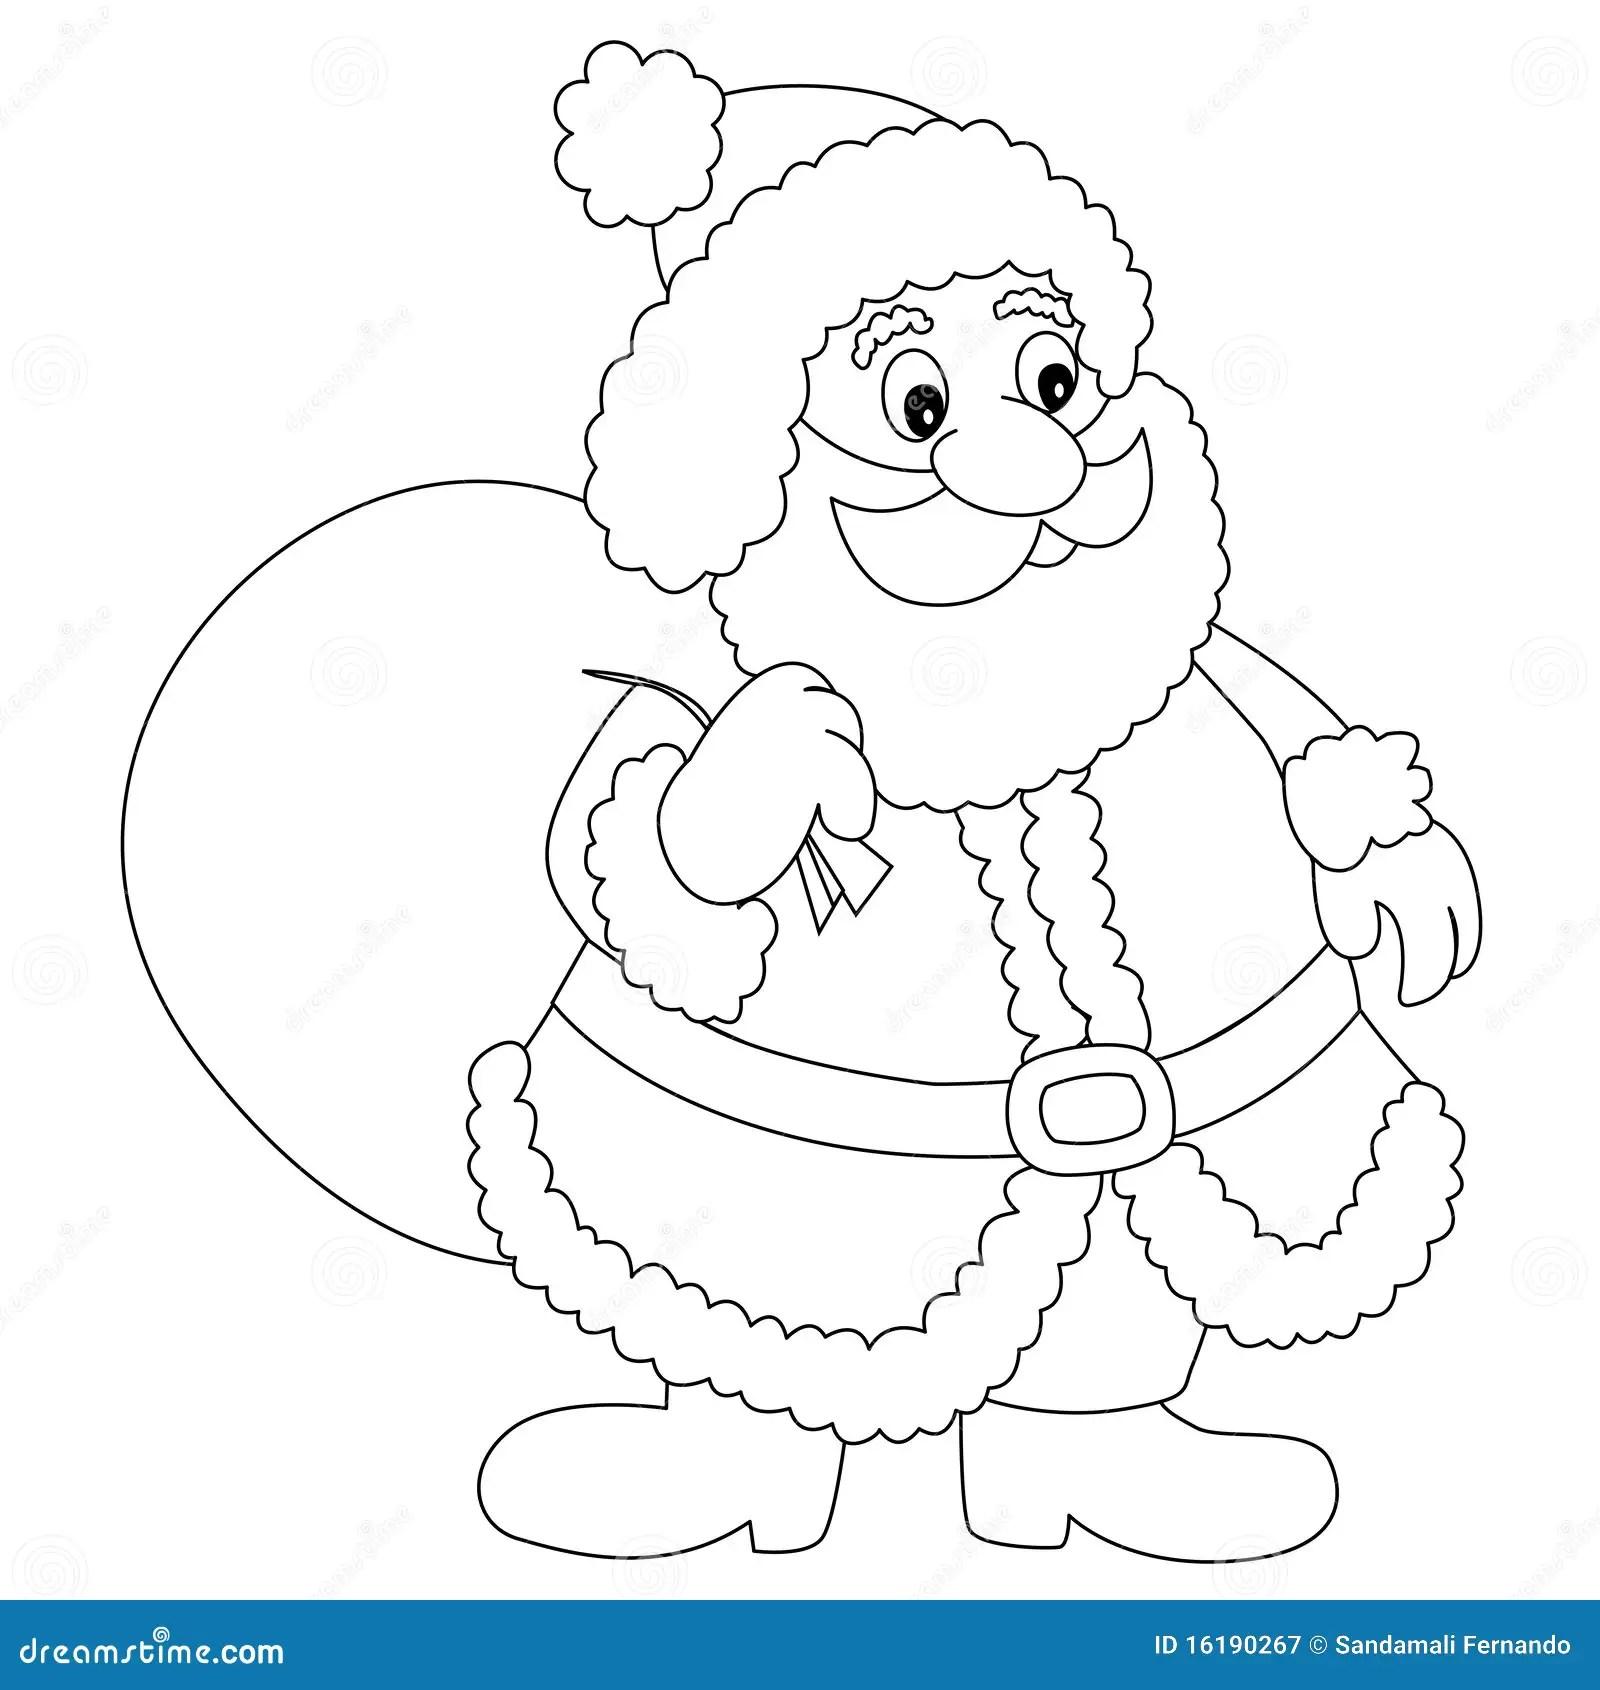 Colouring Outine Of Santas Sleigh